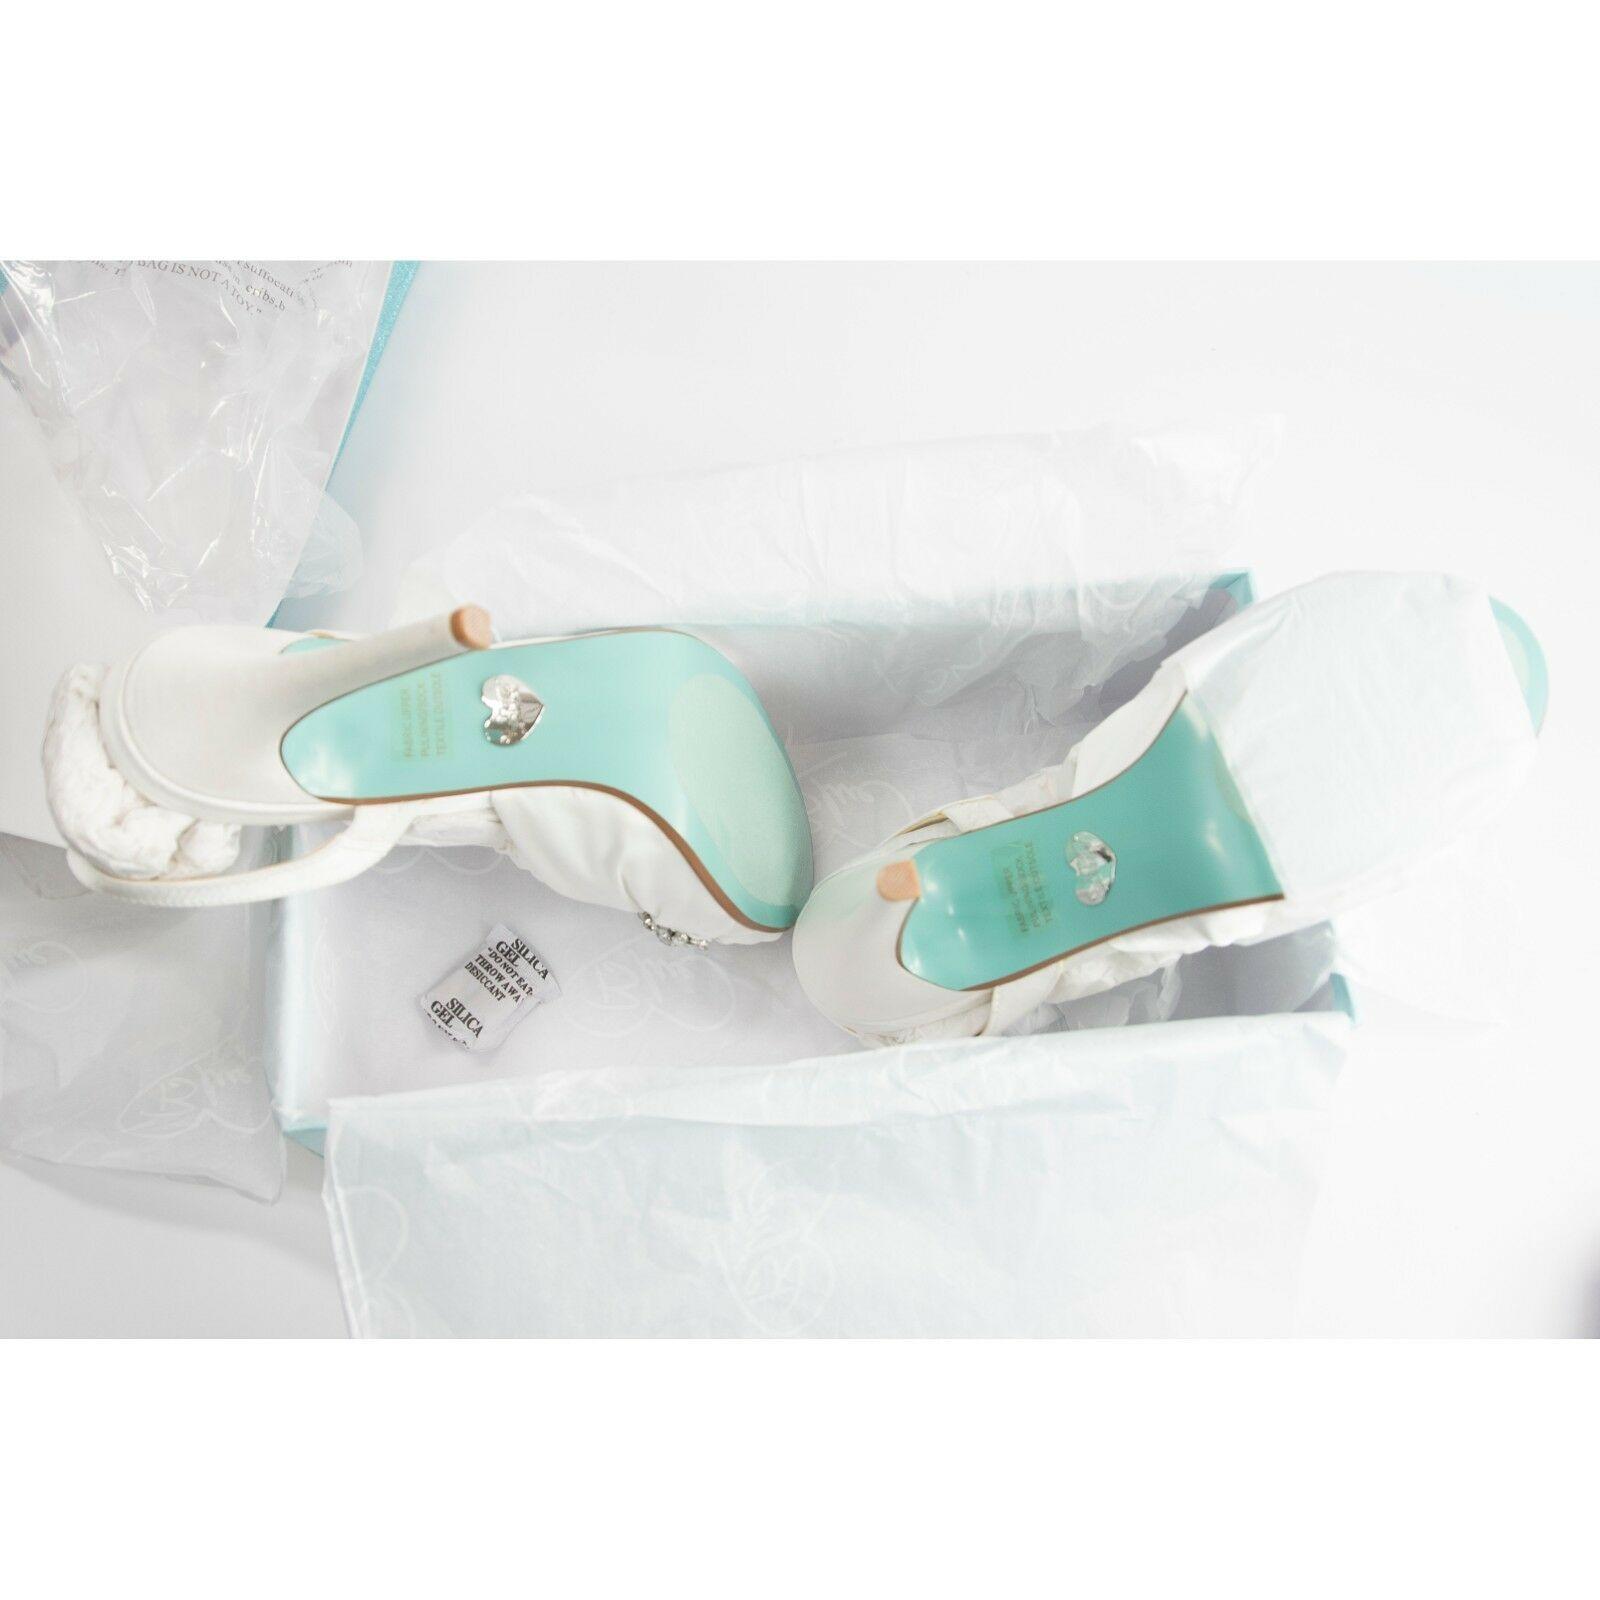 Betsey Johnson Briel Ivory Satin Crystal Wedding Heel Pumps Sandals 7.5